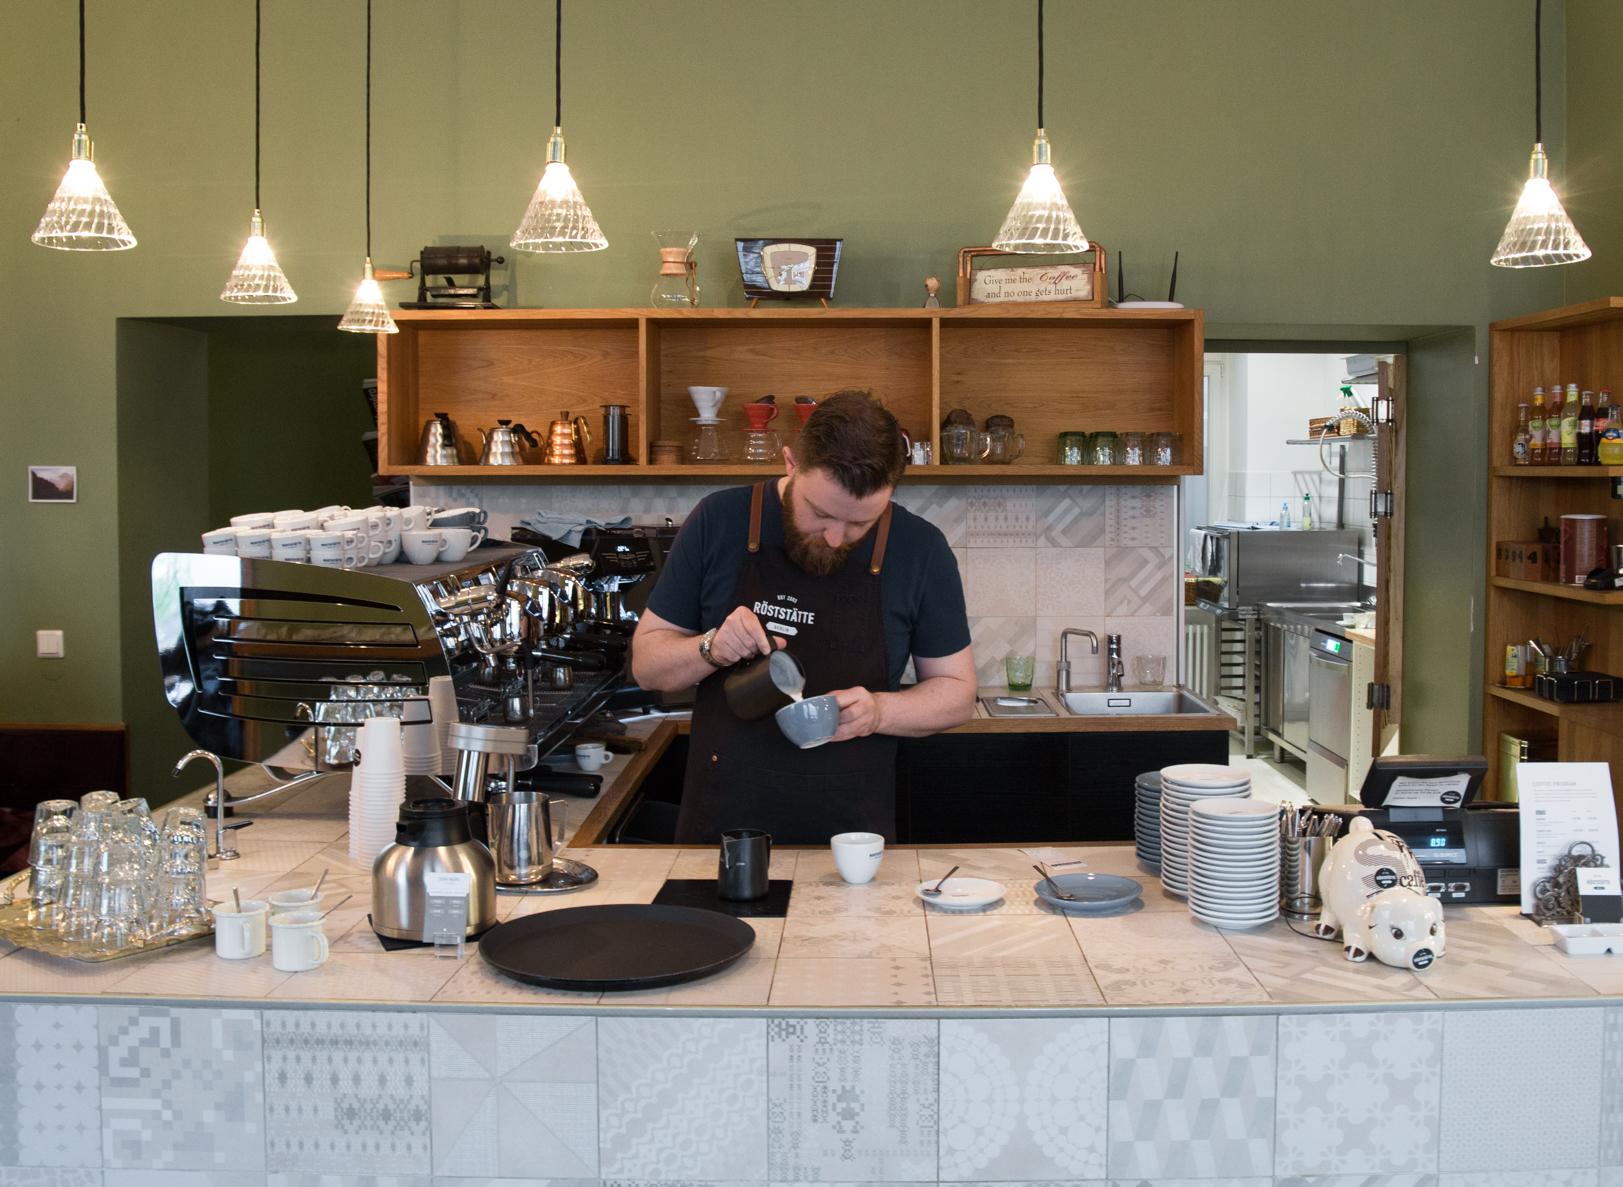 röststätte specialty coffee berlin